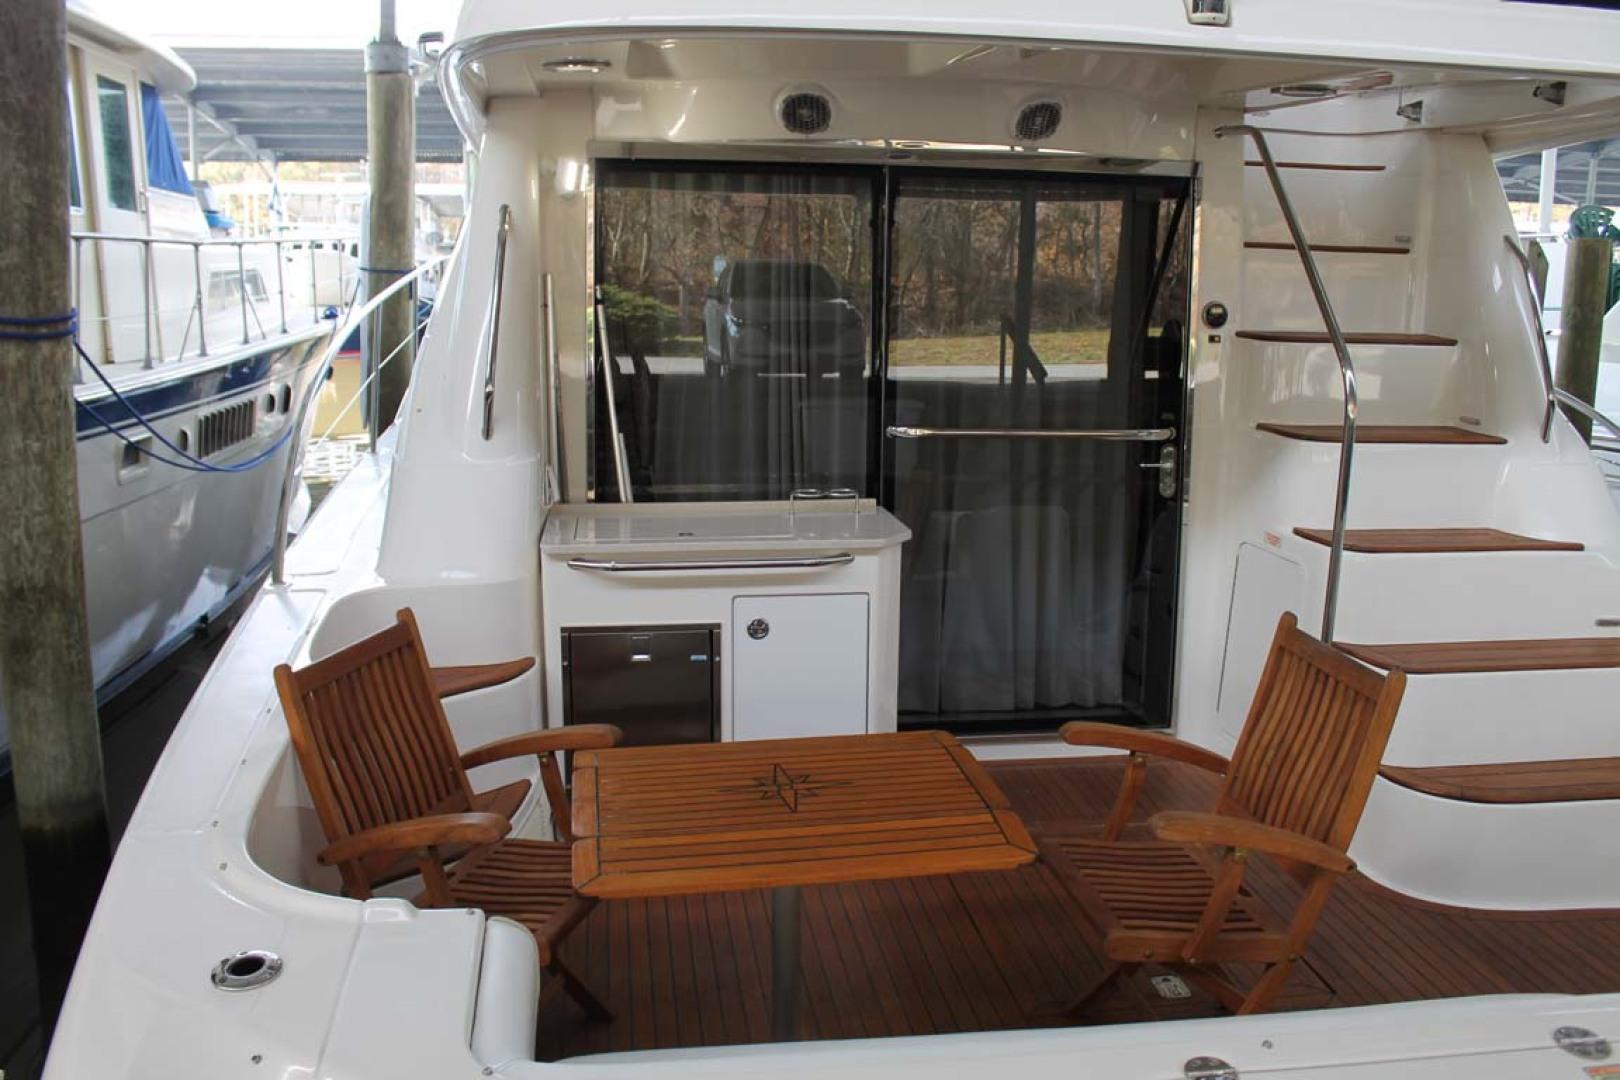 Sea Ray-58 Sedan Bridge 2008-ANANDI Chesapeake City-Maryland-United States-Cockpit-1274131 | Thumbnail